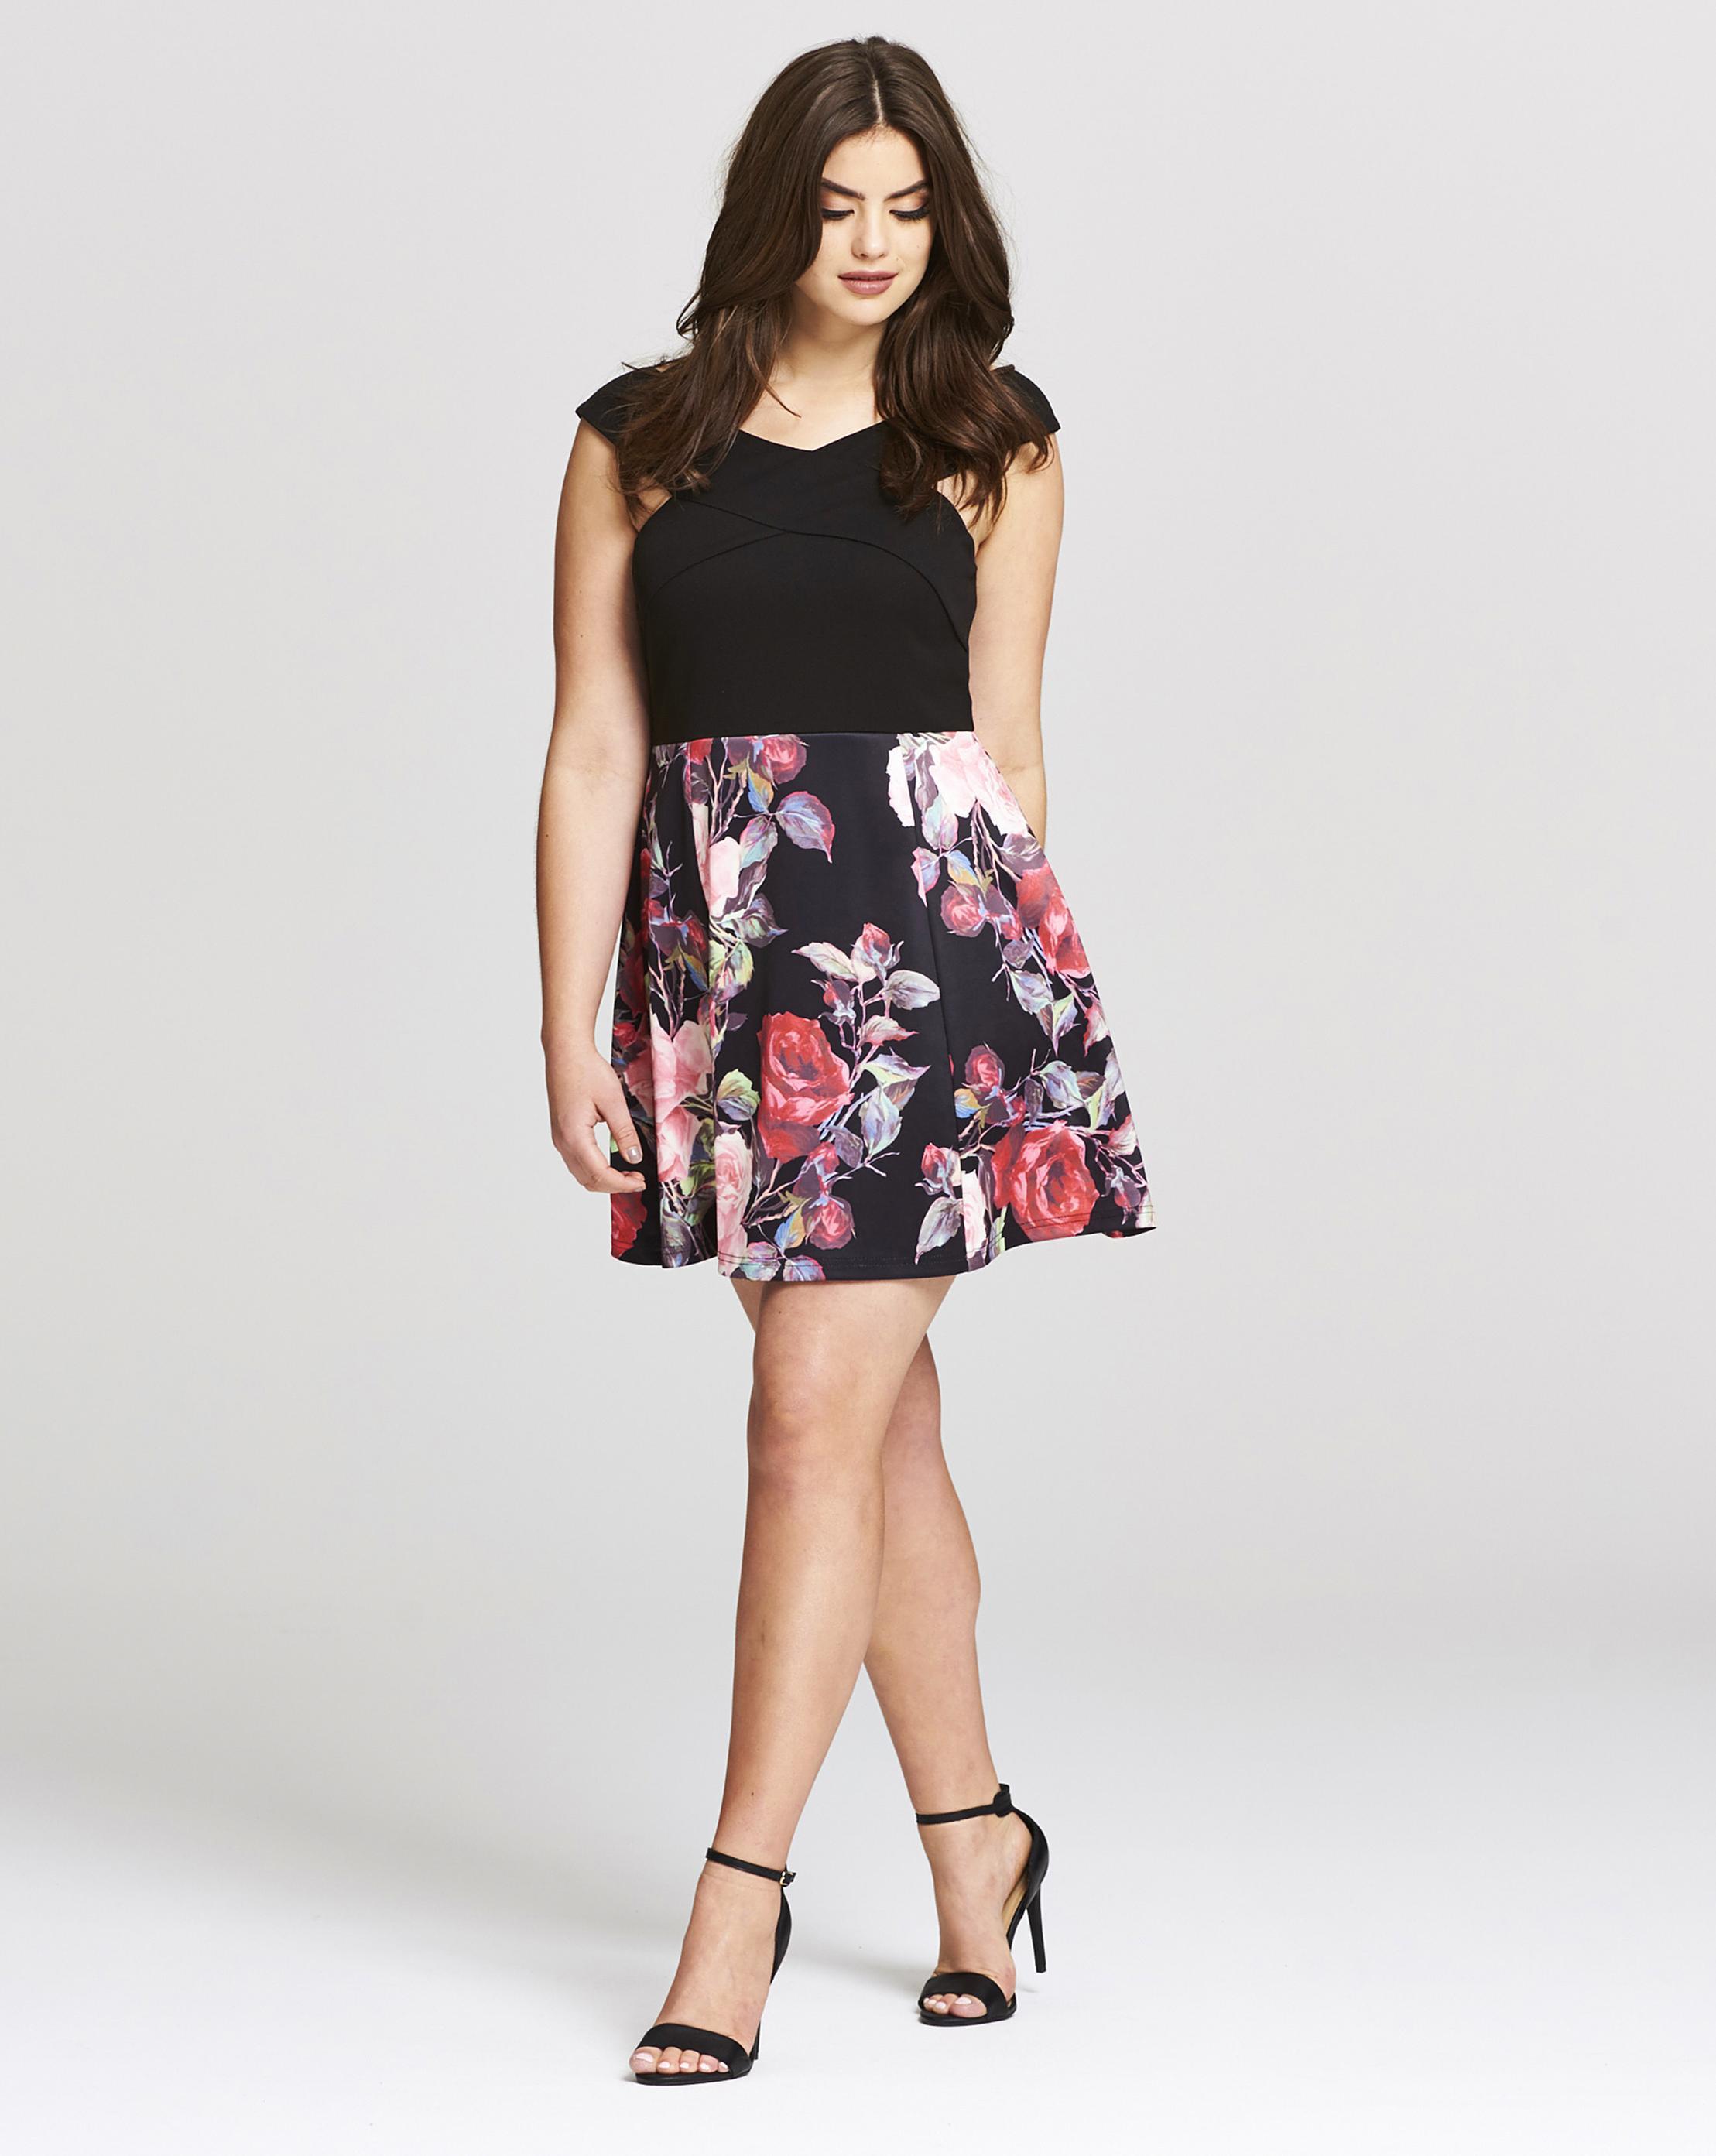 Lyst - Simply Be Ax Paris Bardot Prom Dress